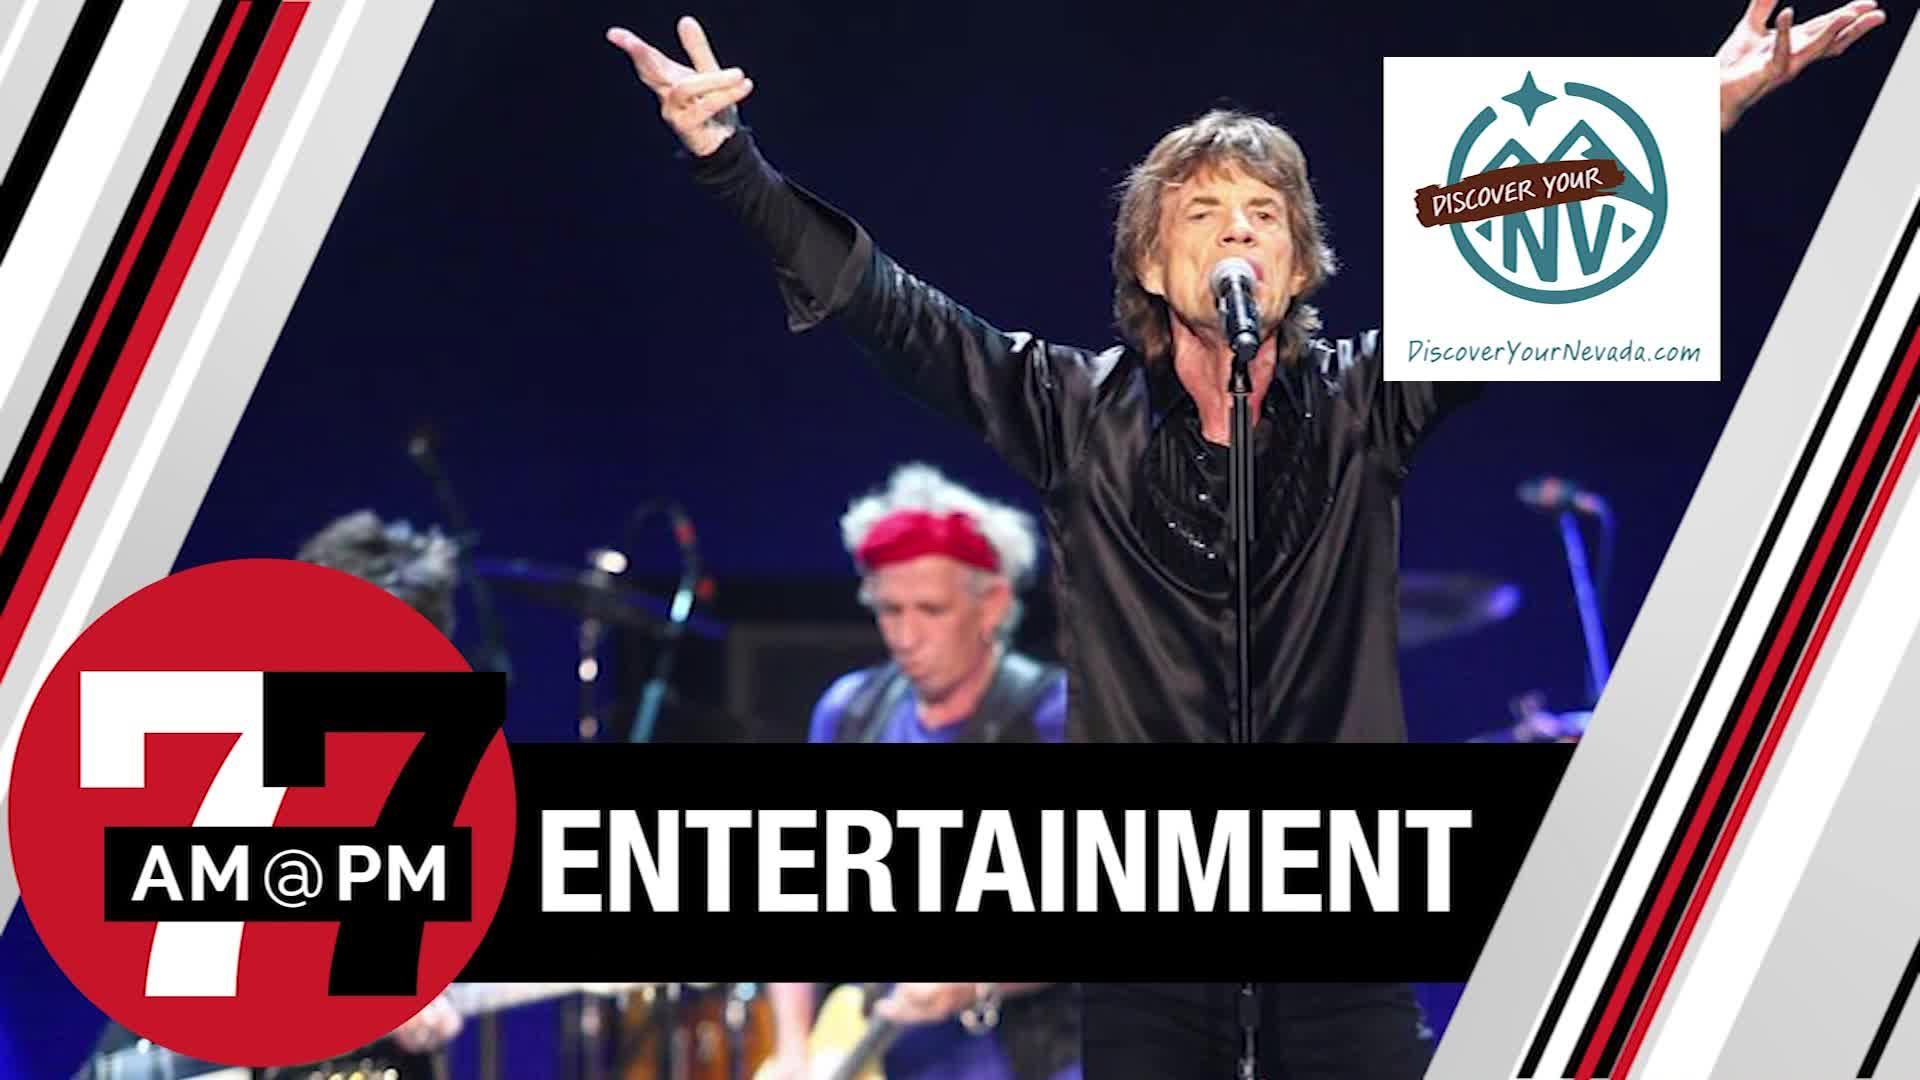 7@7PM Rolling Stones to Return to Las Vegas